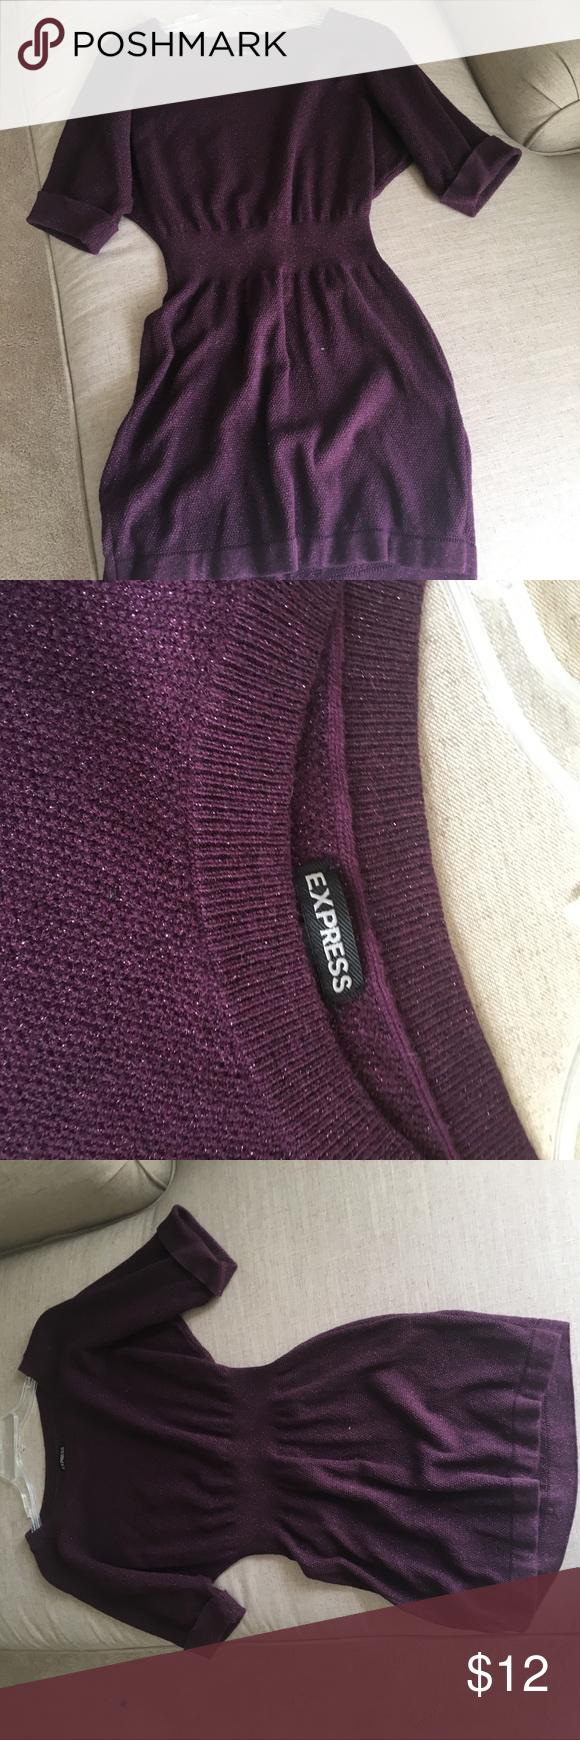 Express Purple Sweater Dress | Express dresses and Purple